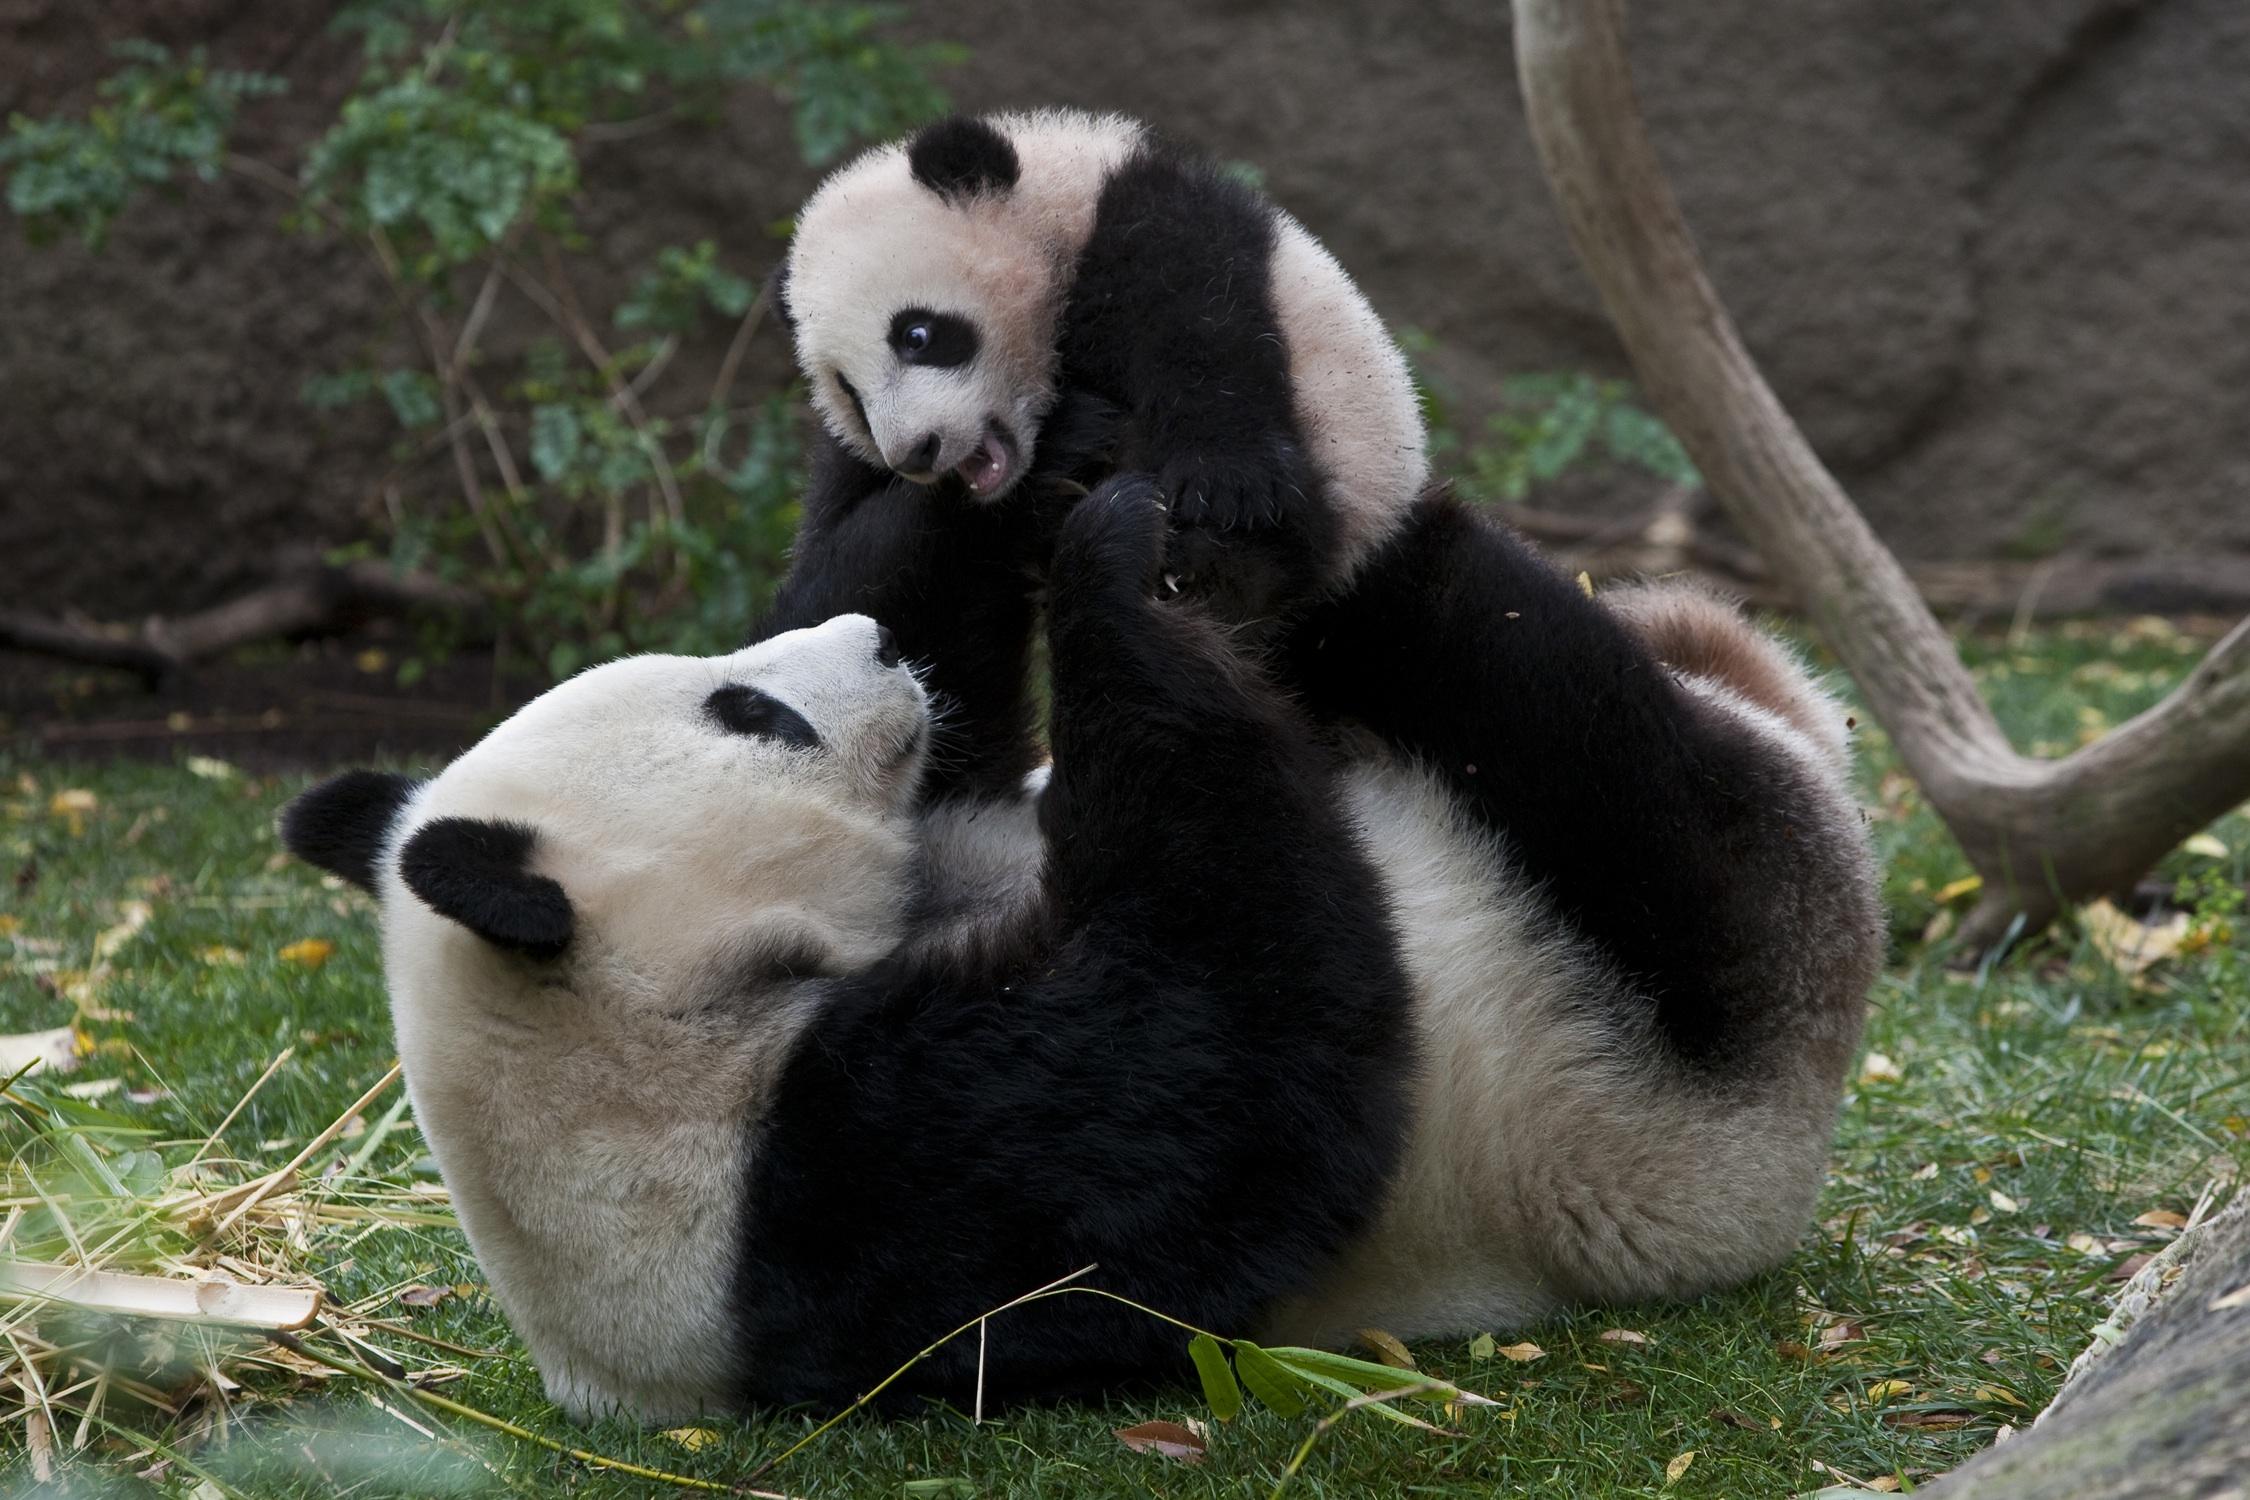 Giant panda mother and cub, Bai Yun and Yun Zi. Photo: A Cute Day/Green Animal World.